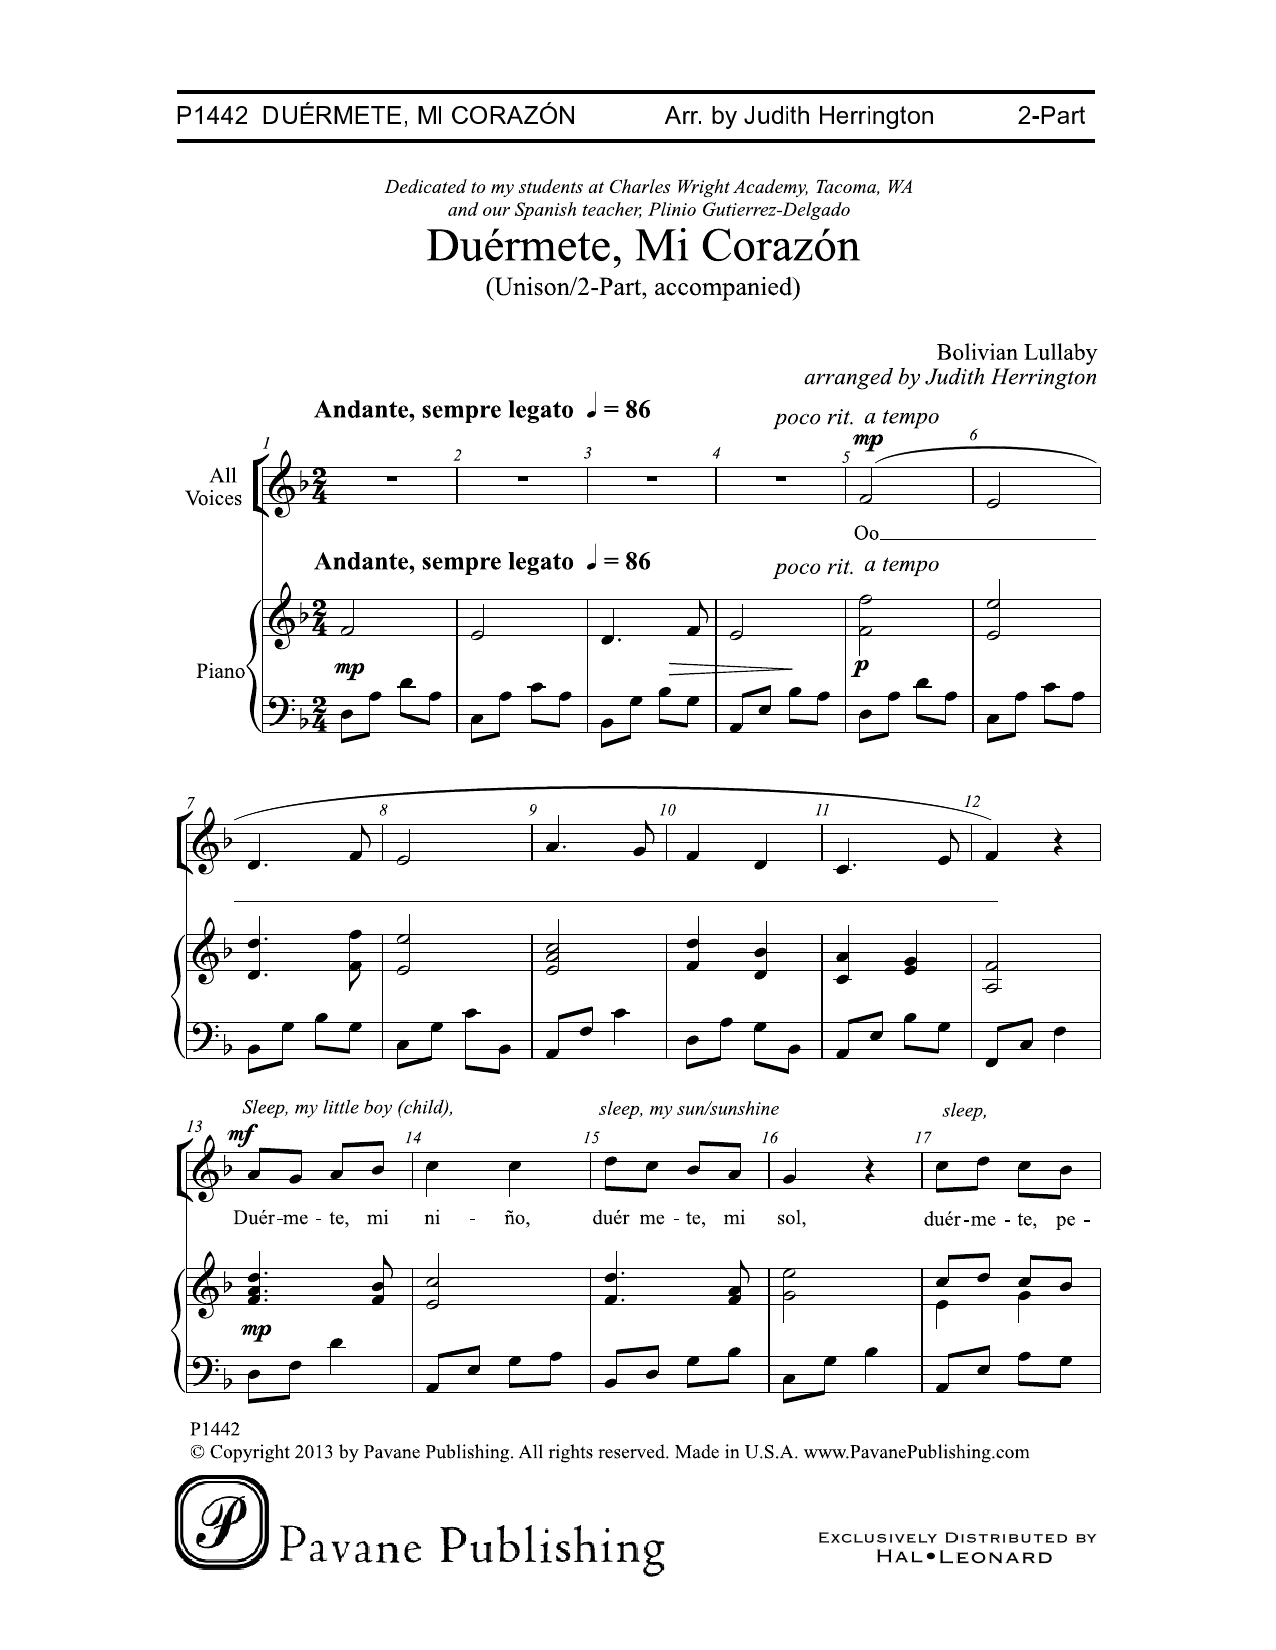 Duermete, Mi Corazon Sheet Music